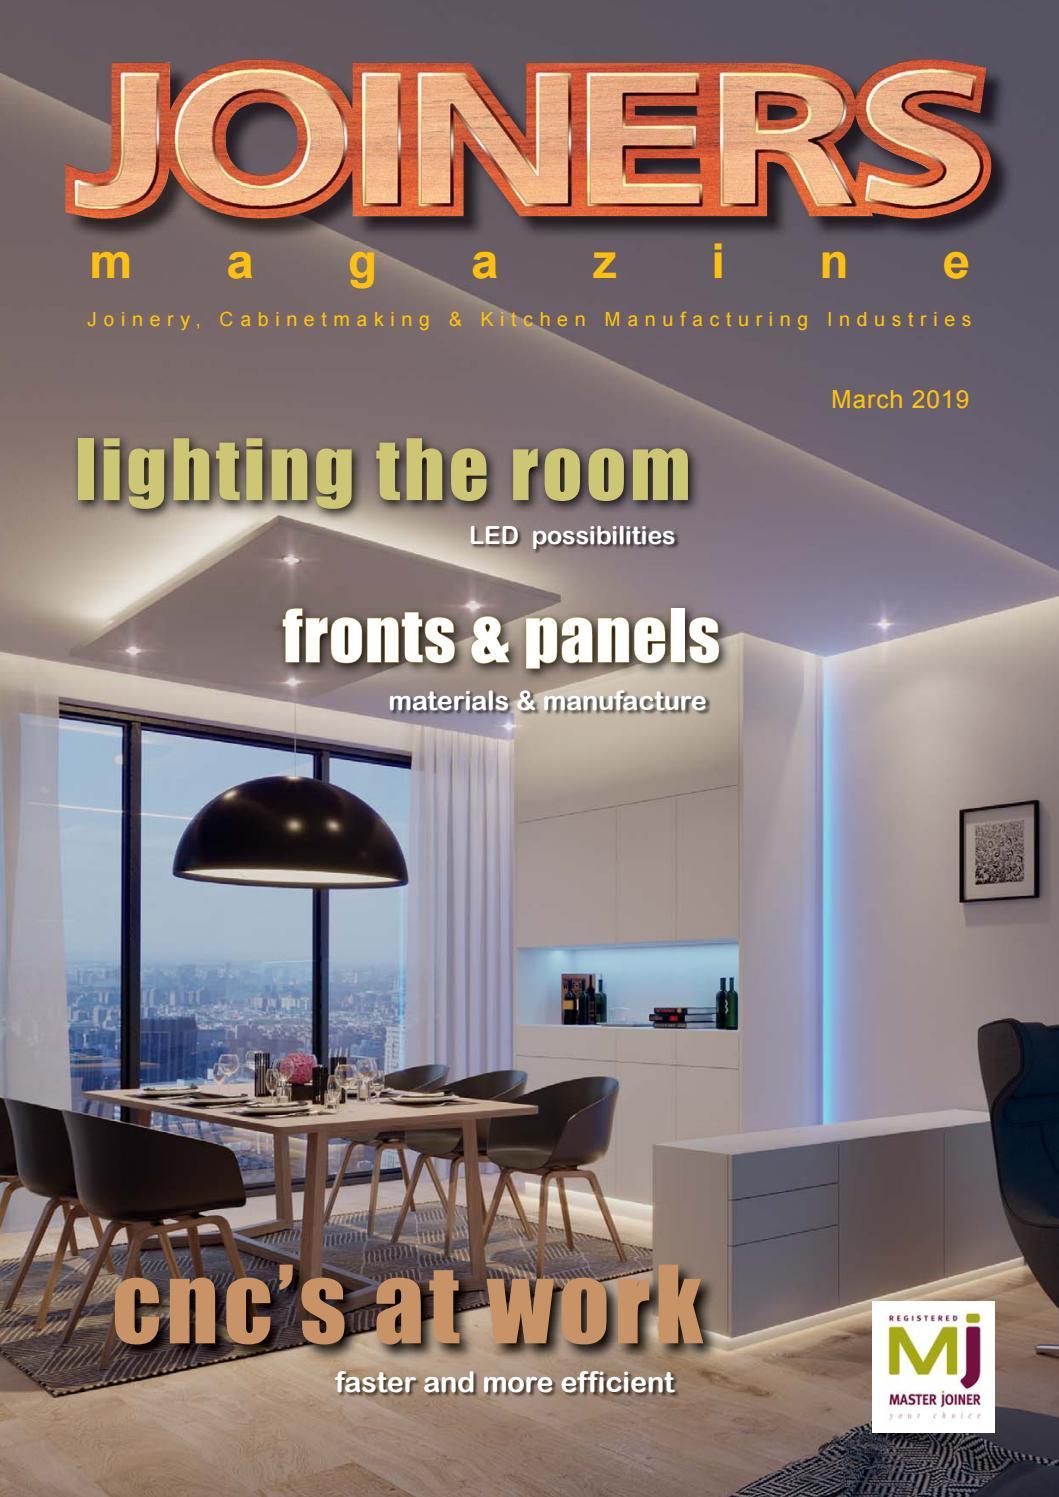 joiners magazine march 2019 by magenta publishing issuu rh issuu com